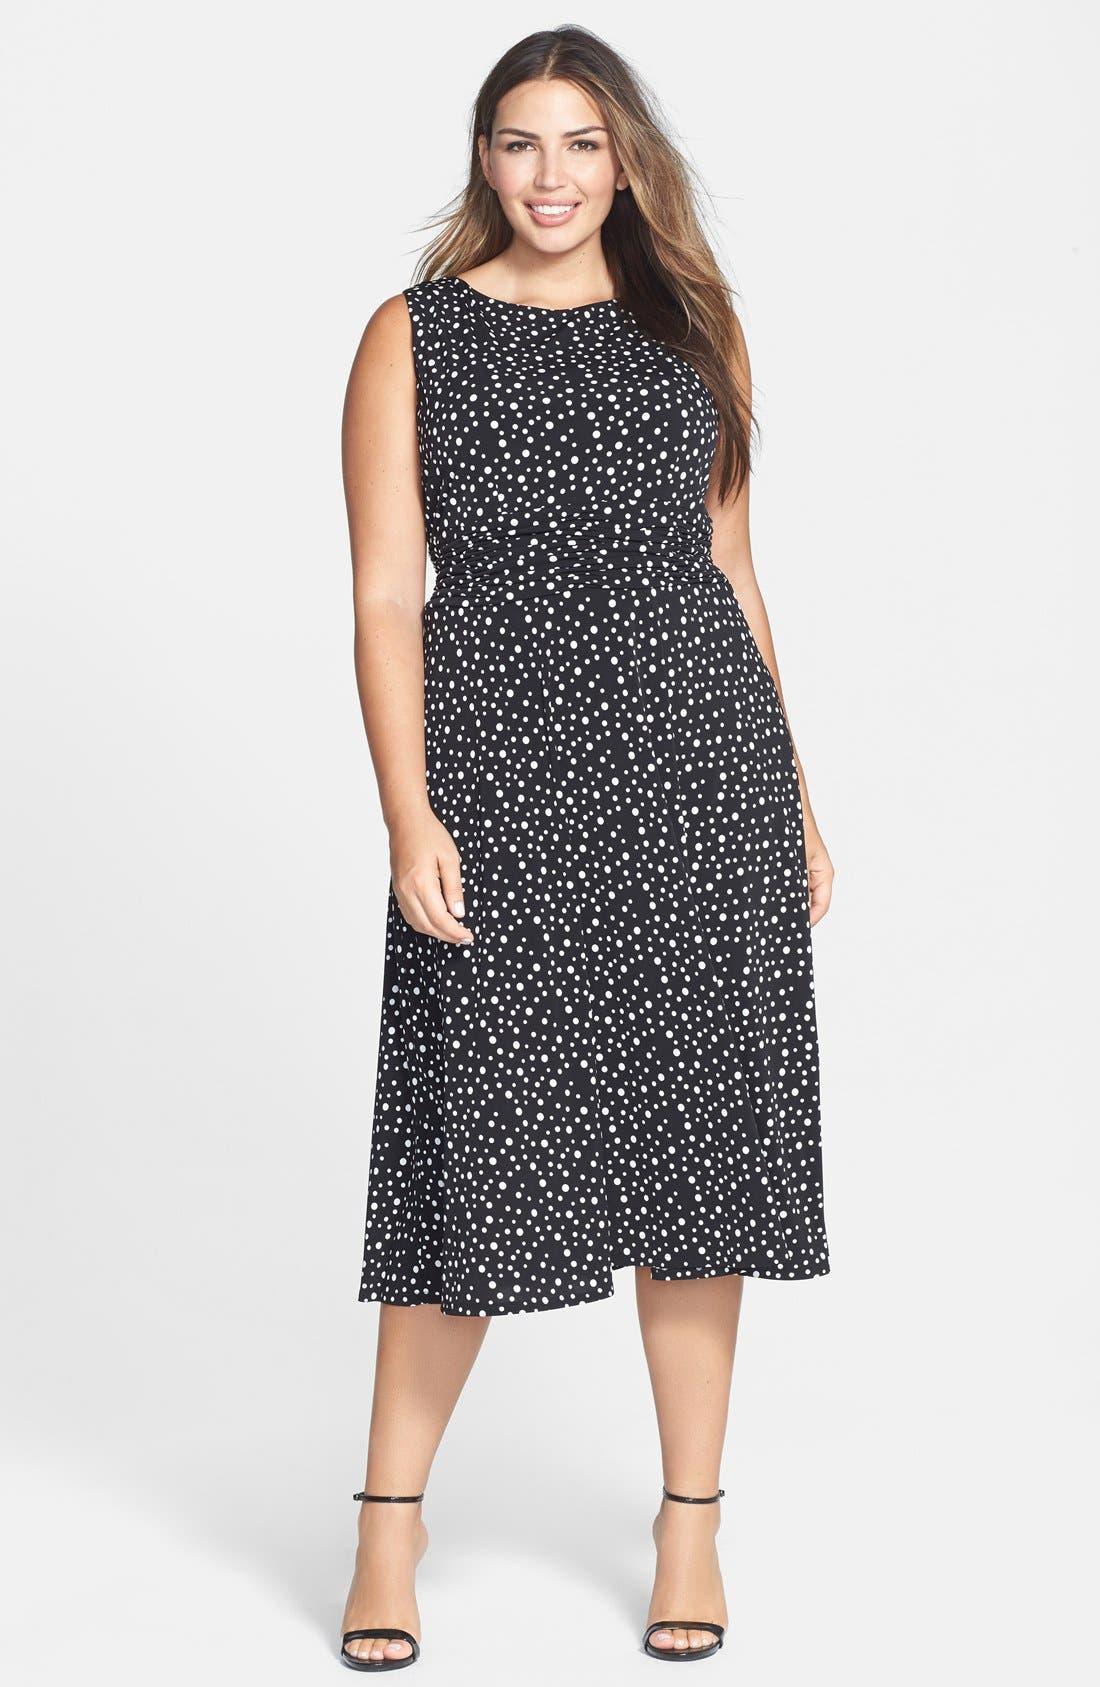 Alternate Image 1 Selected - Jessica Howard Print Ruched Waist Midi Dress (Plus Size)